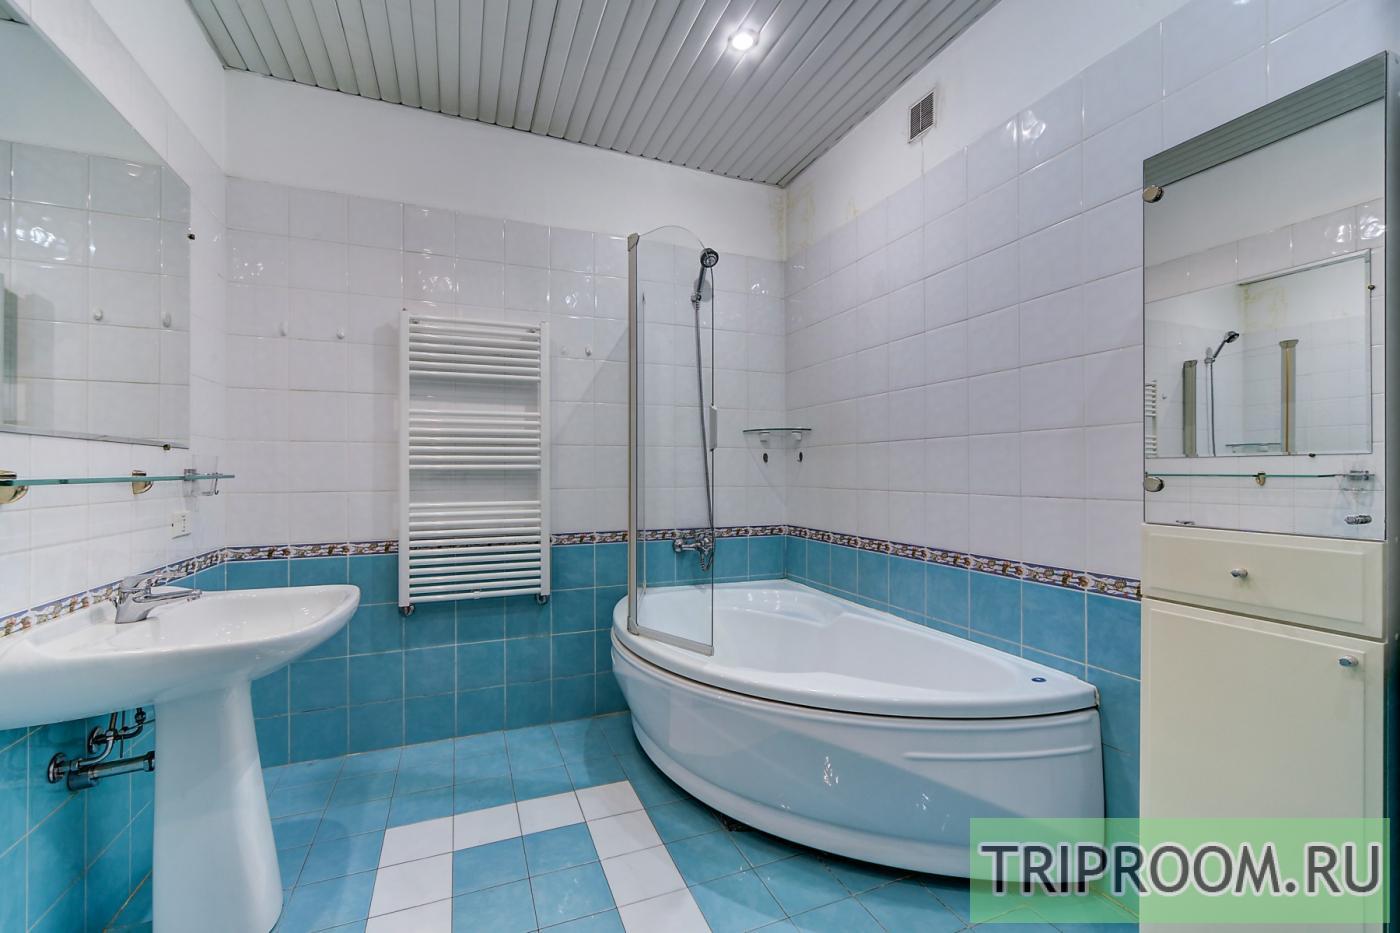 2-комнатная квартира посуточно (вариант № 20143), ул. Невский проспект, фото № 11